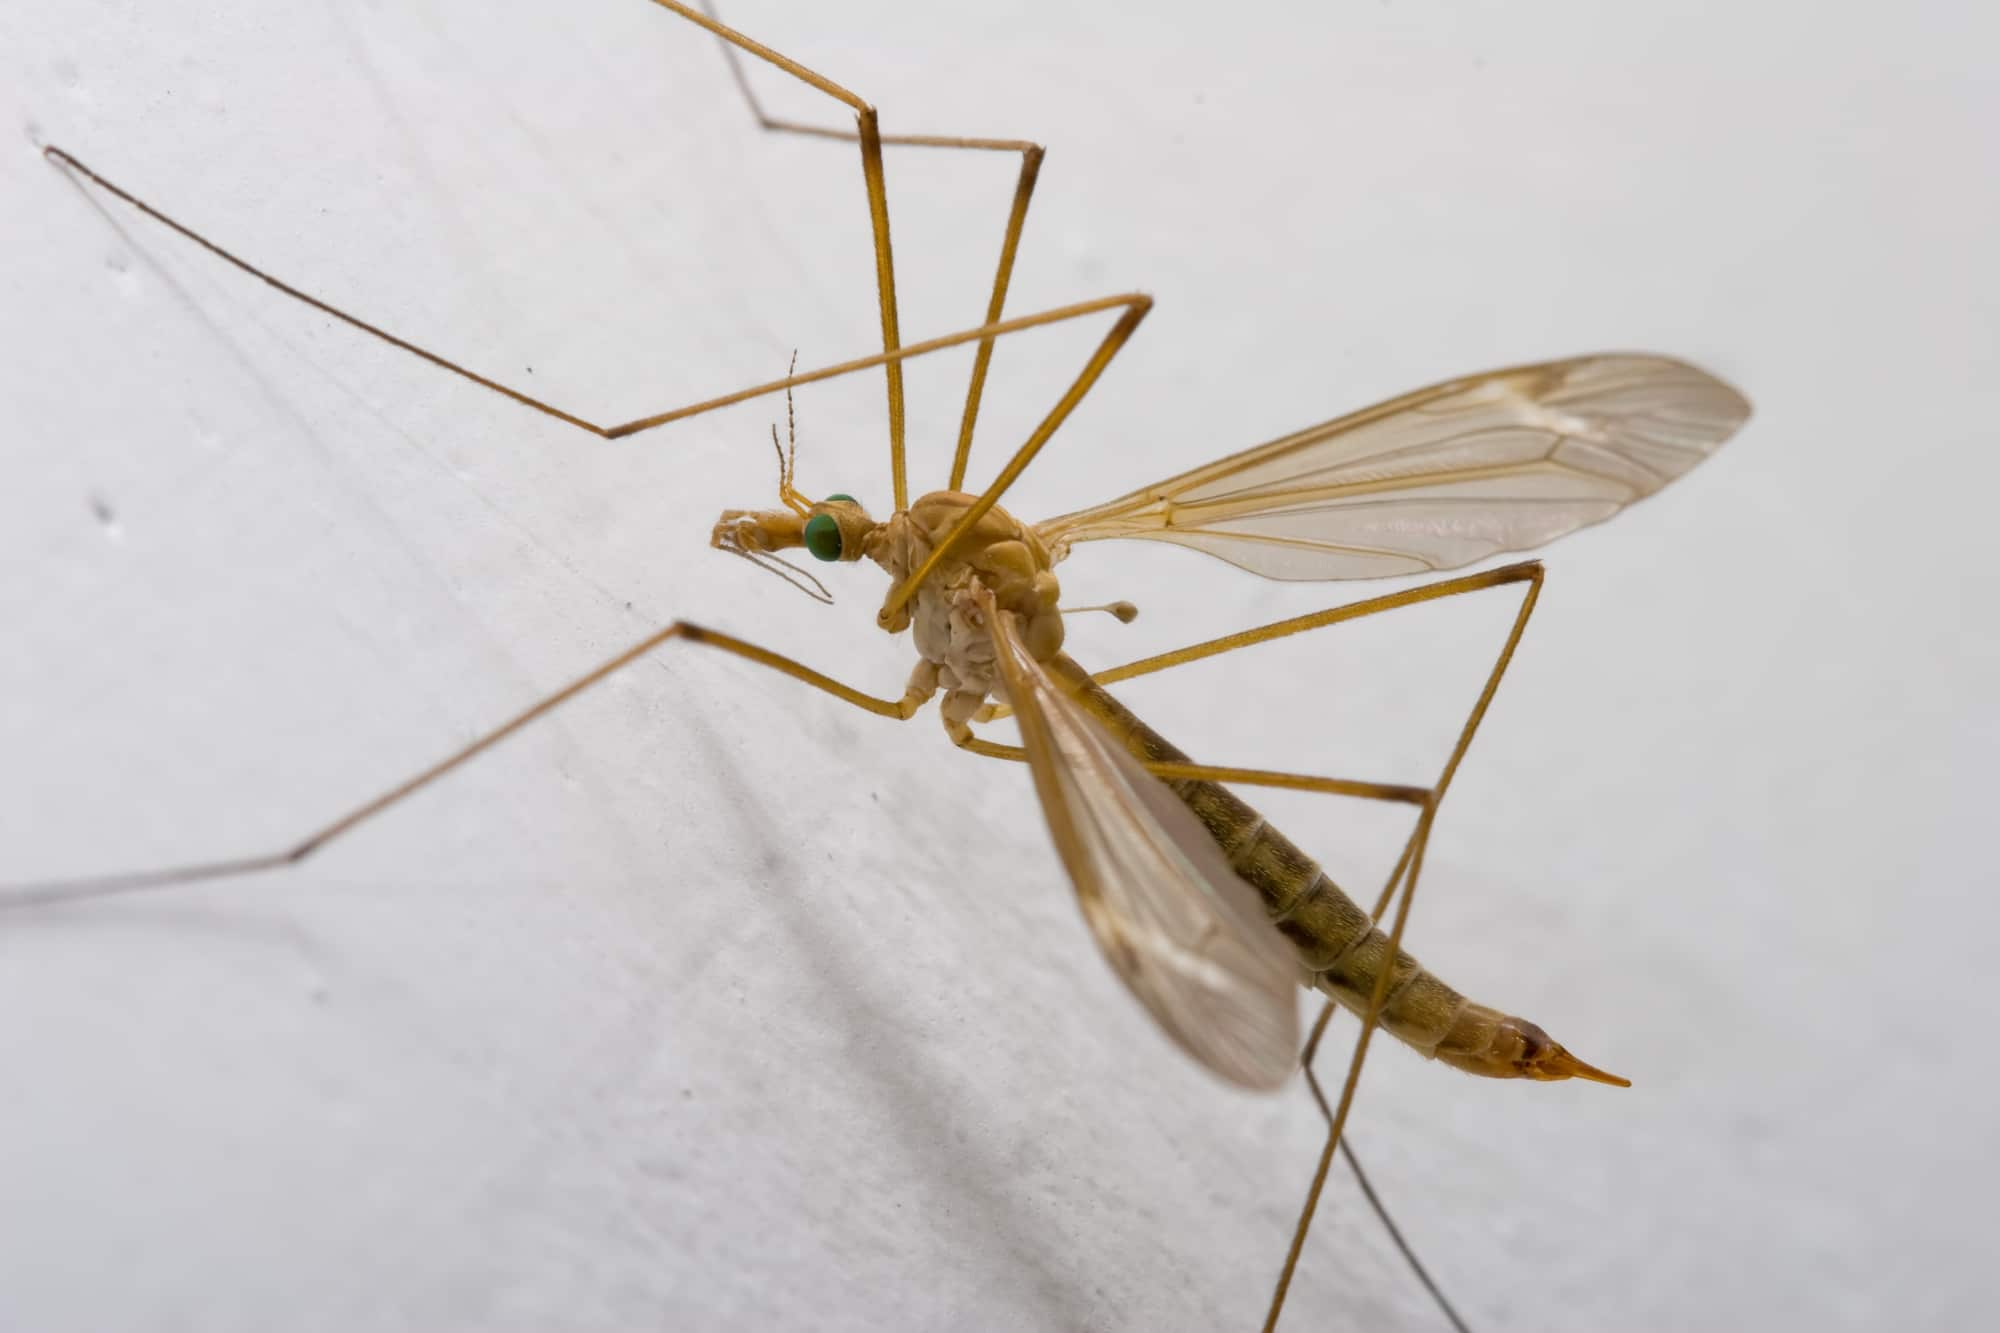 A closeup of a crane fly